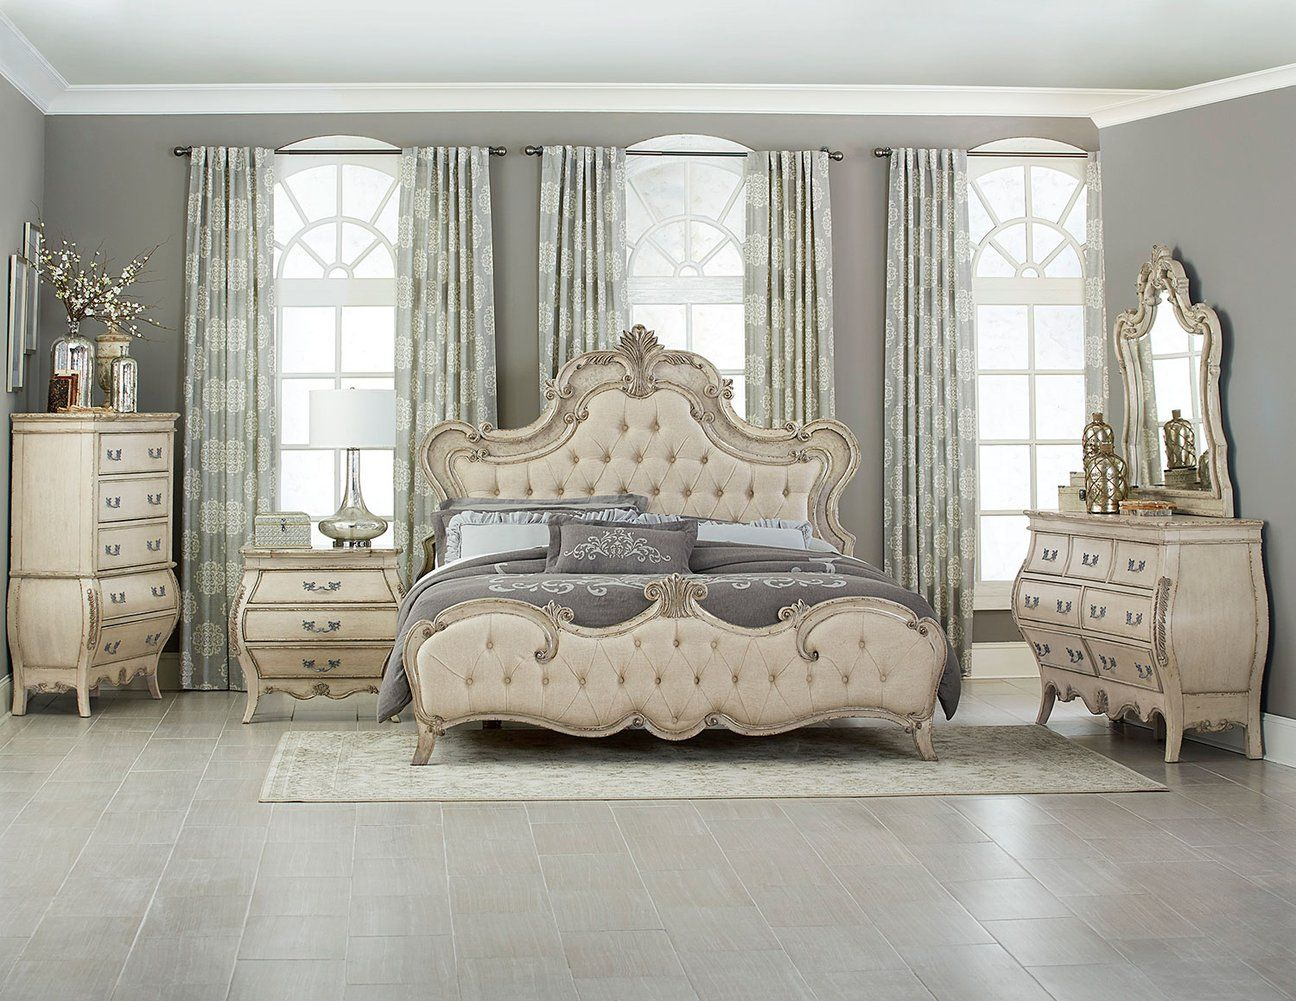 Elsmere 4pcs Traditional Antique Grey Button Tufted King Bedroom Set Antique White Bedroom Furniture Upholstered Bedroom Set Bedroom Sets